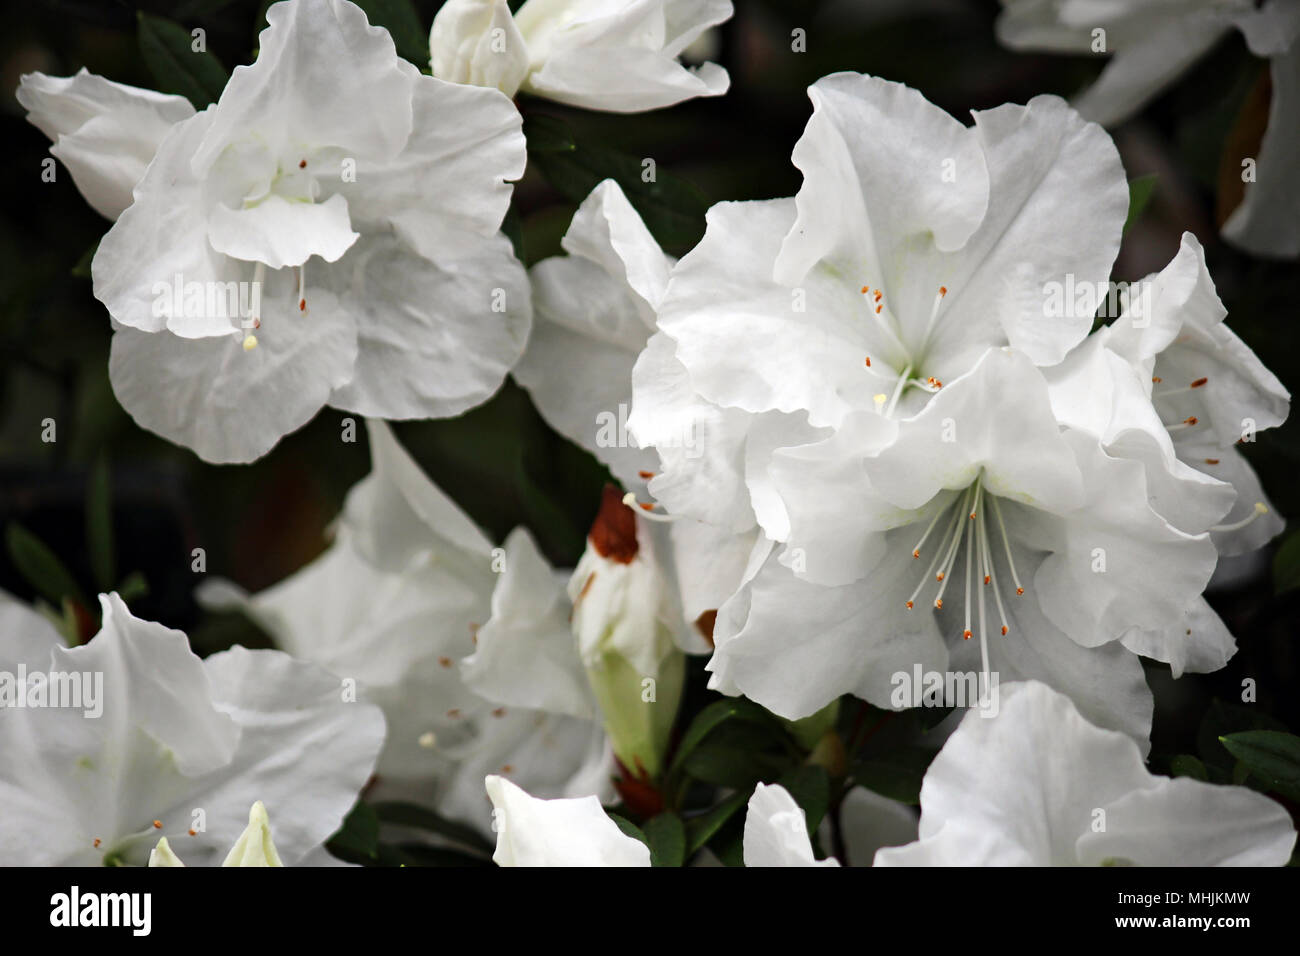 Close Up Of Multiple Blooming White Autumn Angel Encore Azalea